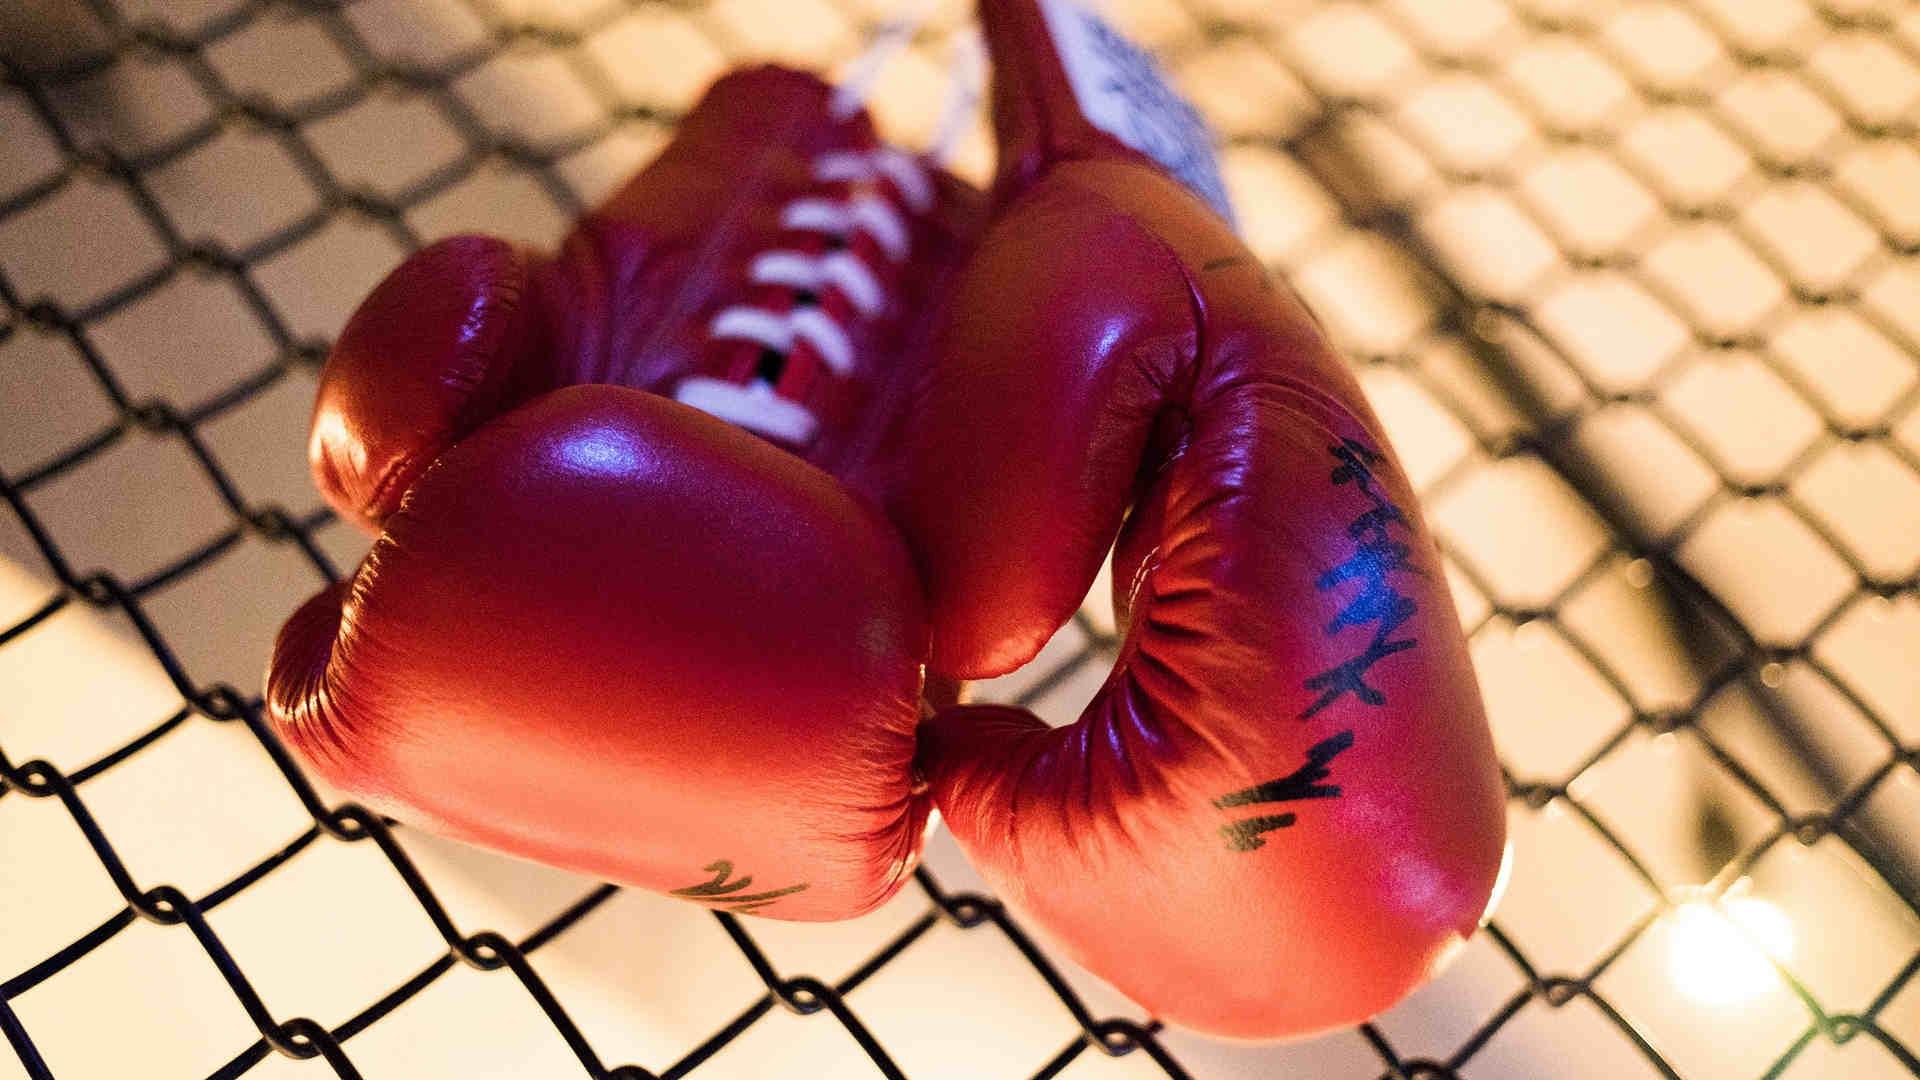 perchatki-boxerskie-1xbet